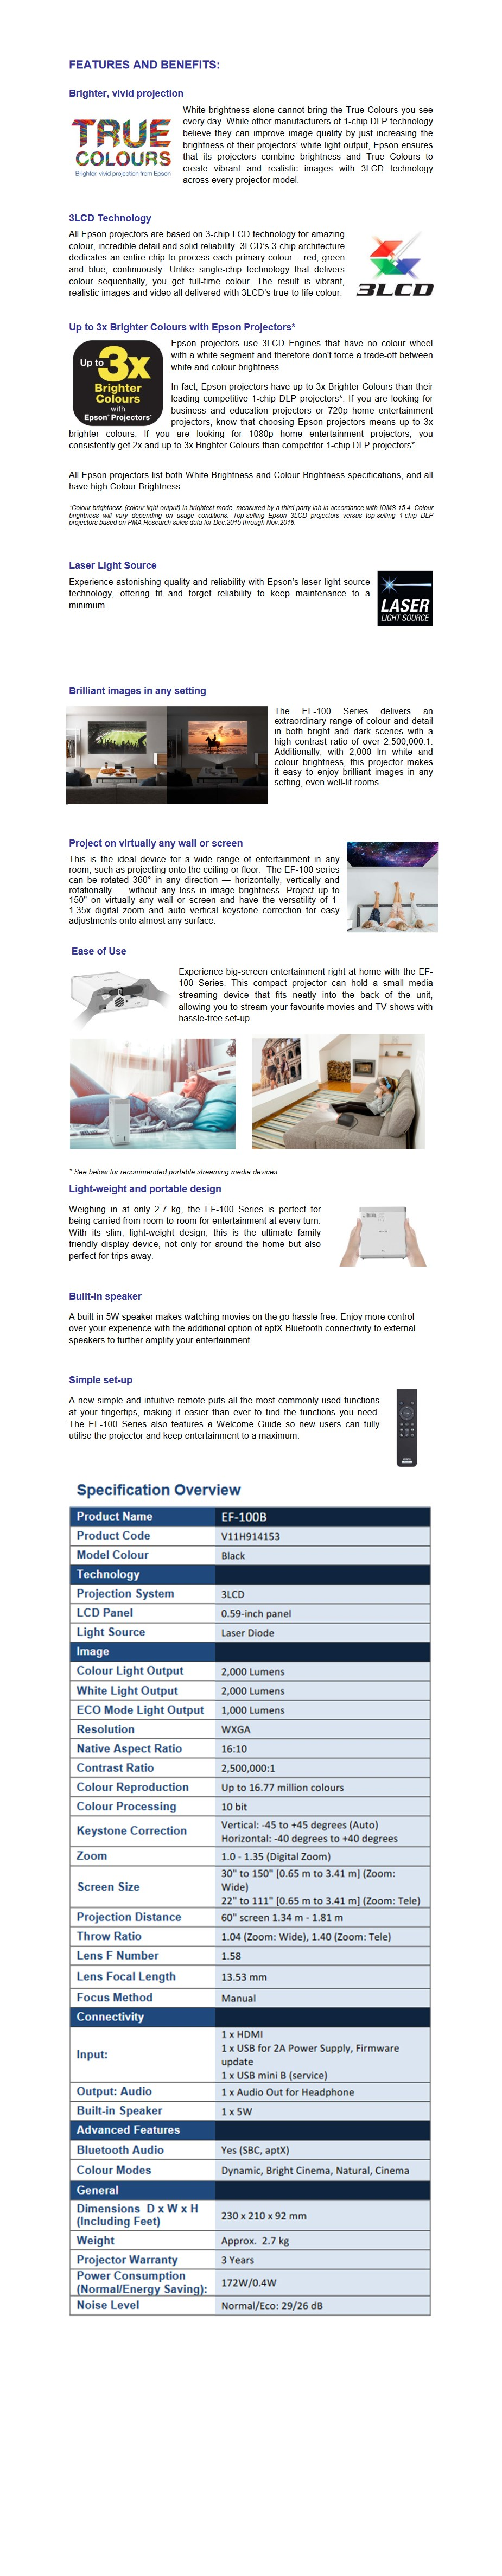 Epson EF-100B WXGA Portable Home Entertainment Projector - Black - Desktop Overview 1